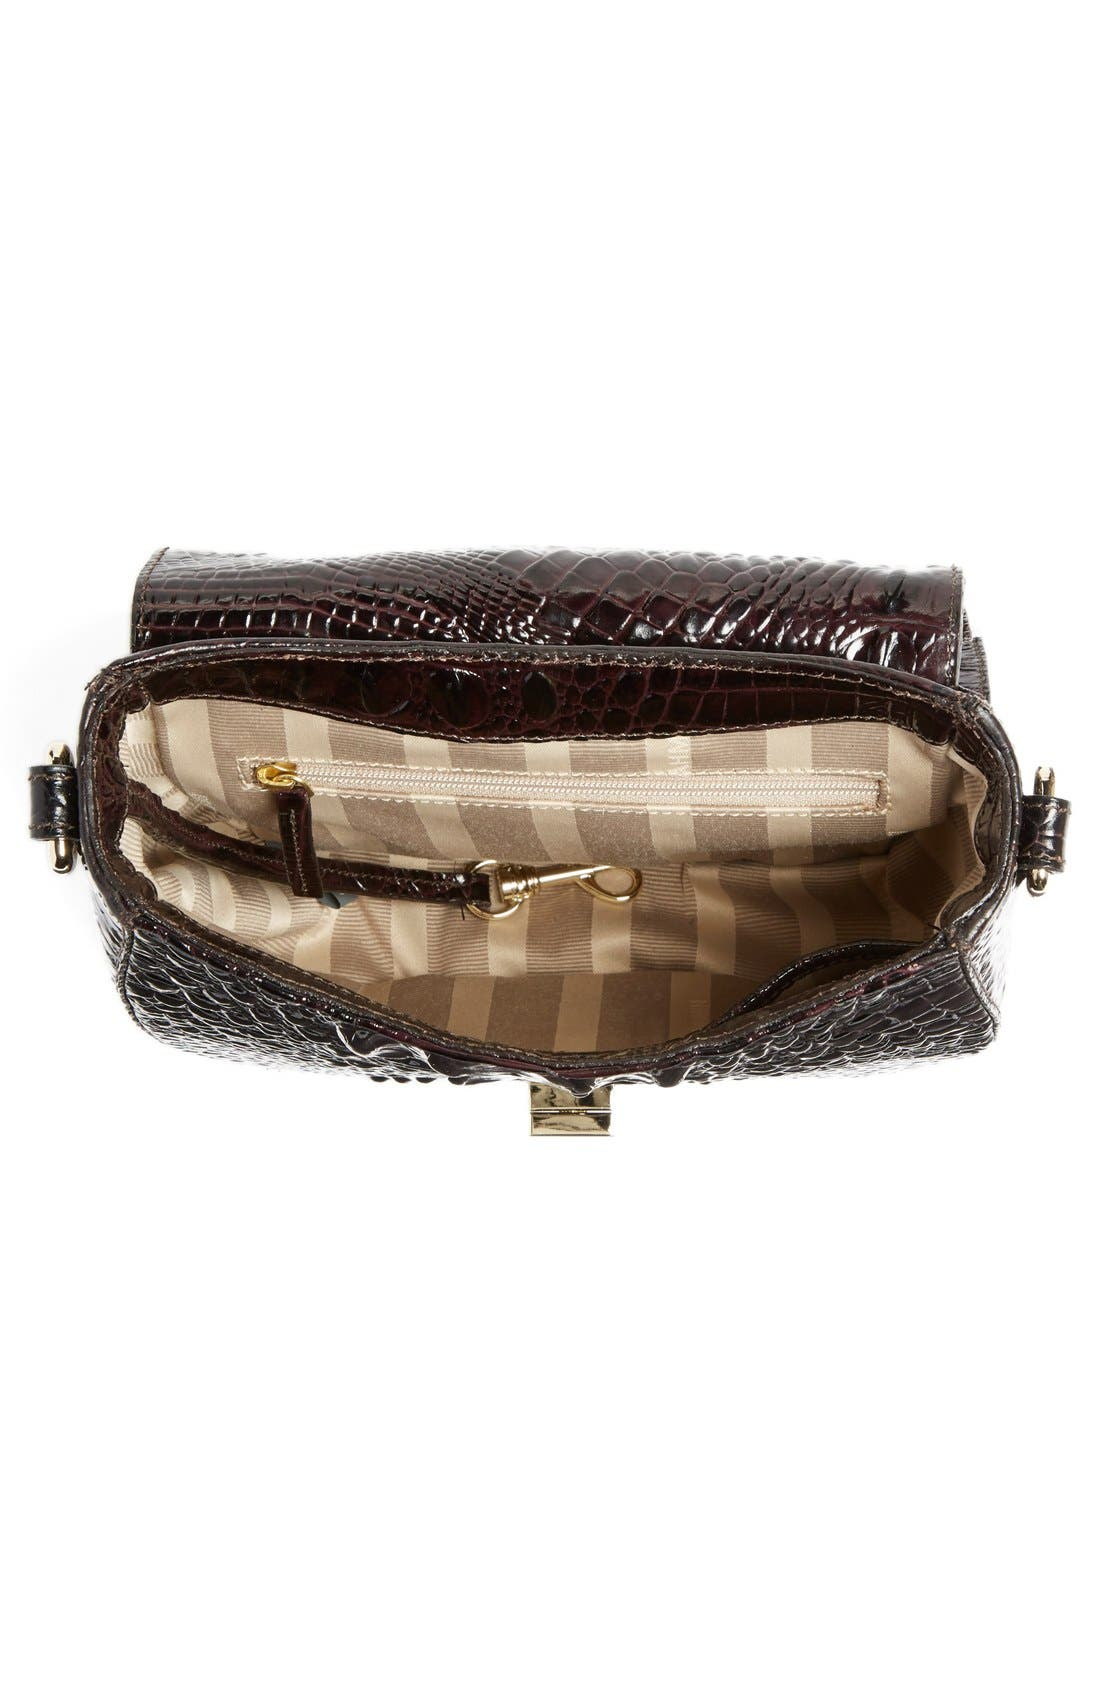 Alternate Image 4  - Brahmin 'Tillie' Embossed Leather Crossbody Bag (Nordstrom Exclusive)